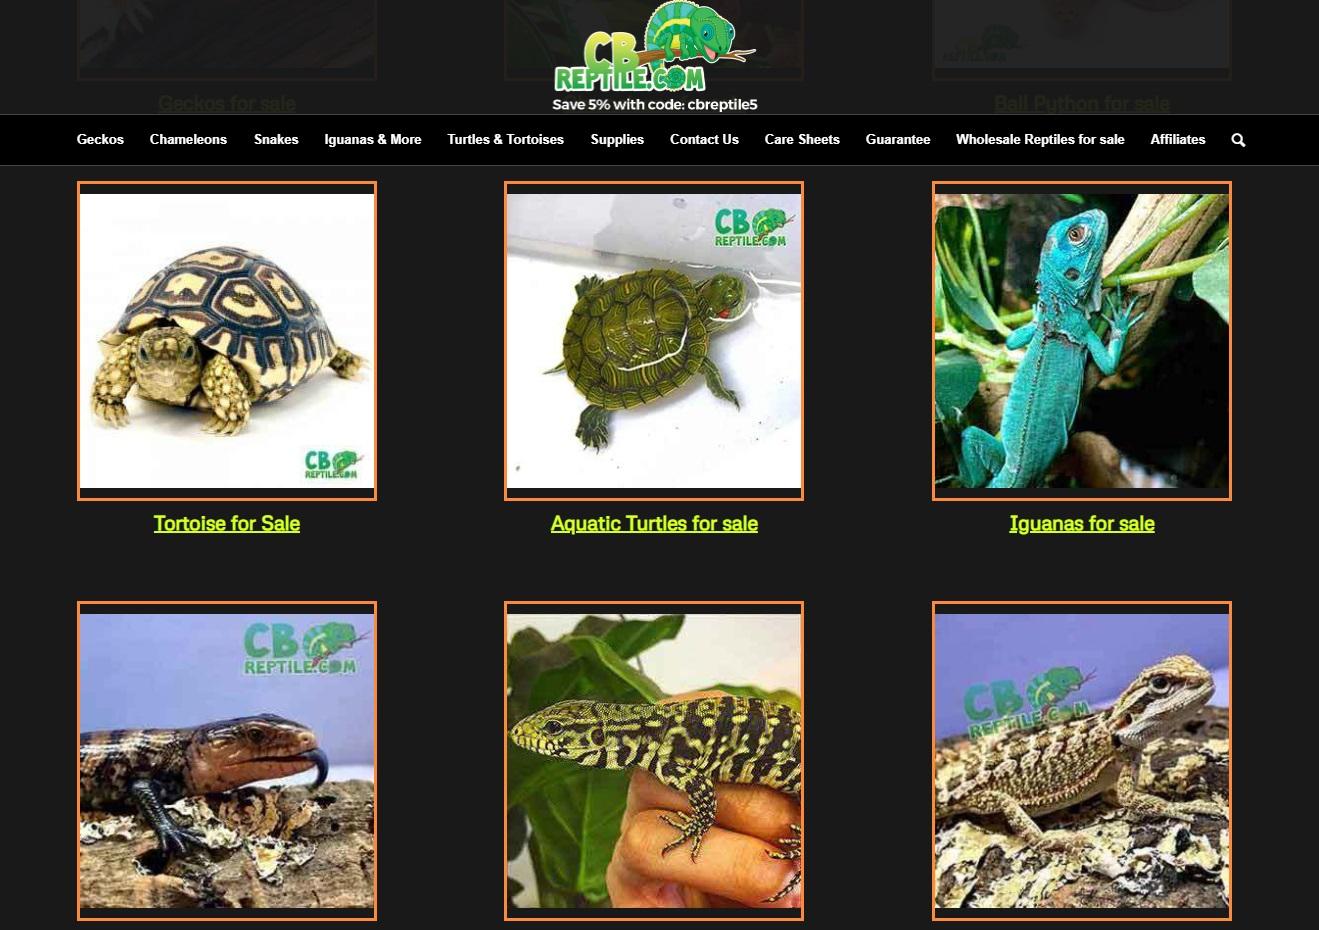 cb-reptile-beardie-breeder-site-screenshot